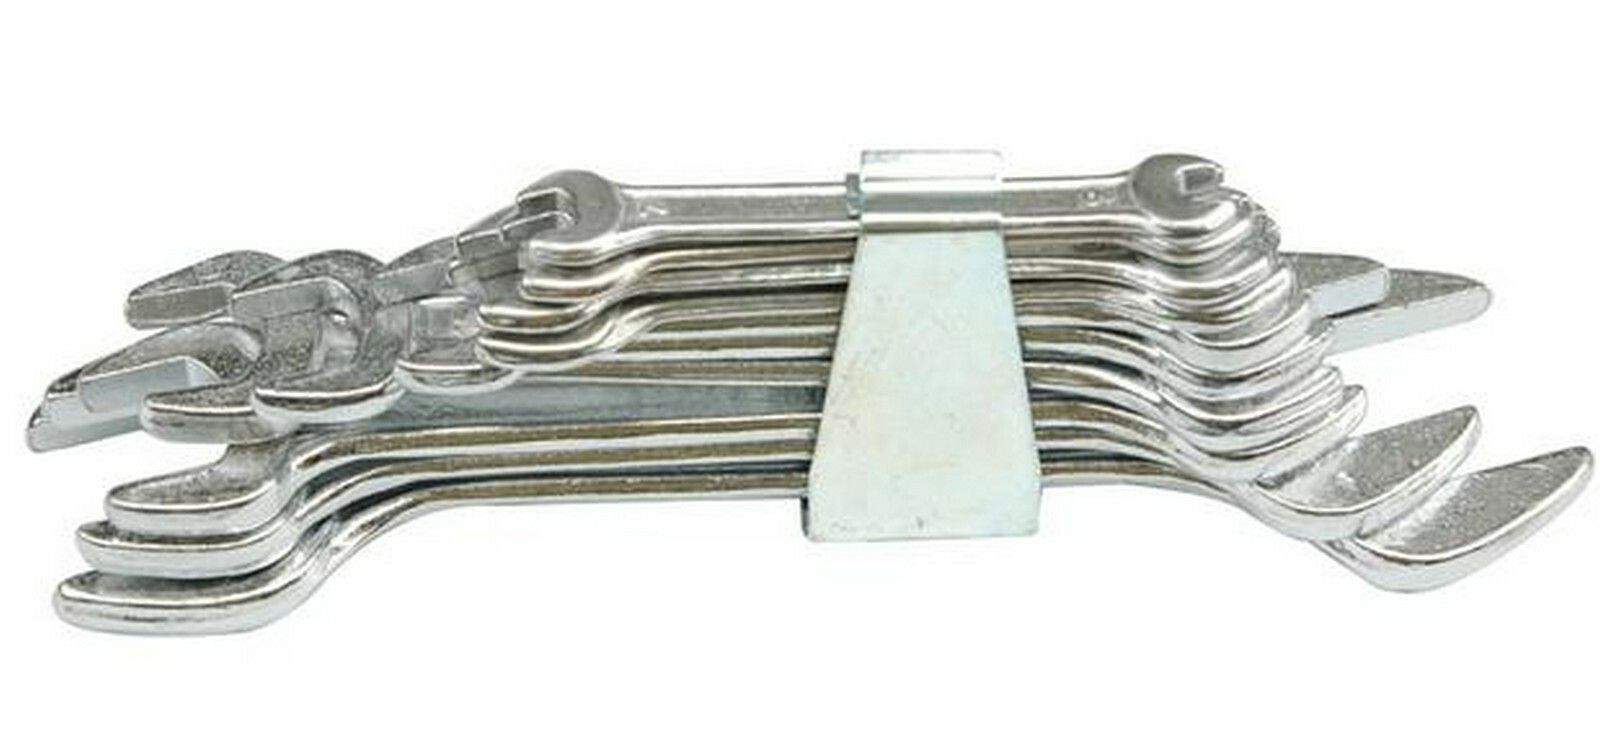 Sada klíčů plochých 12 ks 6 - 32 mm spona TOYA